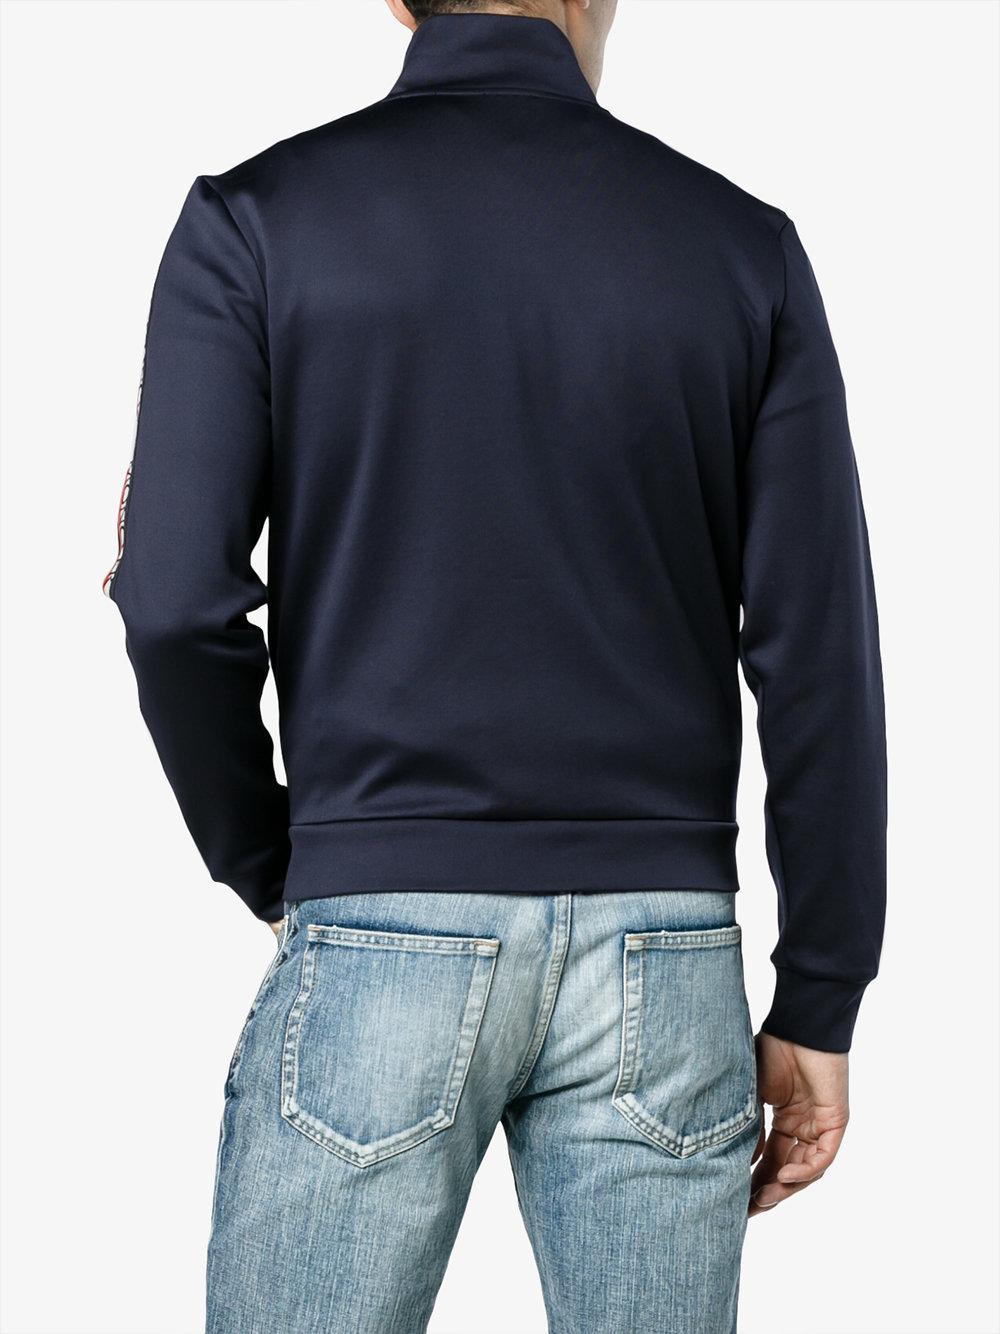 3ac0420fd Lyst - Moncler Side Stripe Jacket in Blue for Men